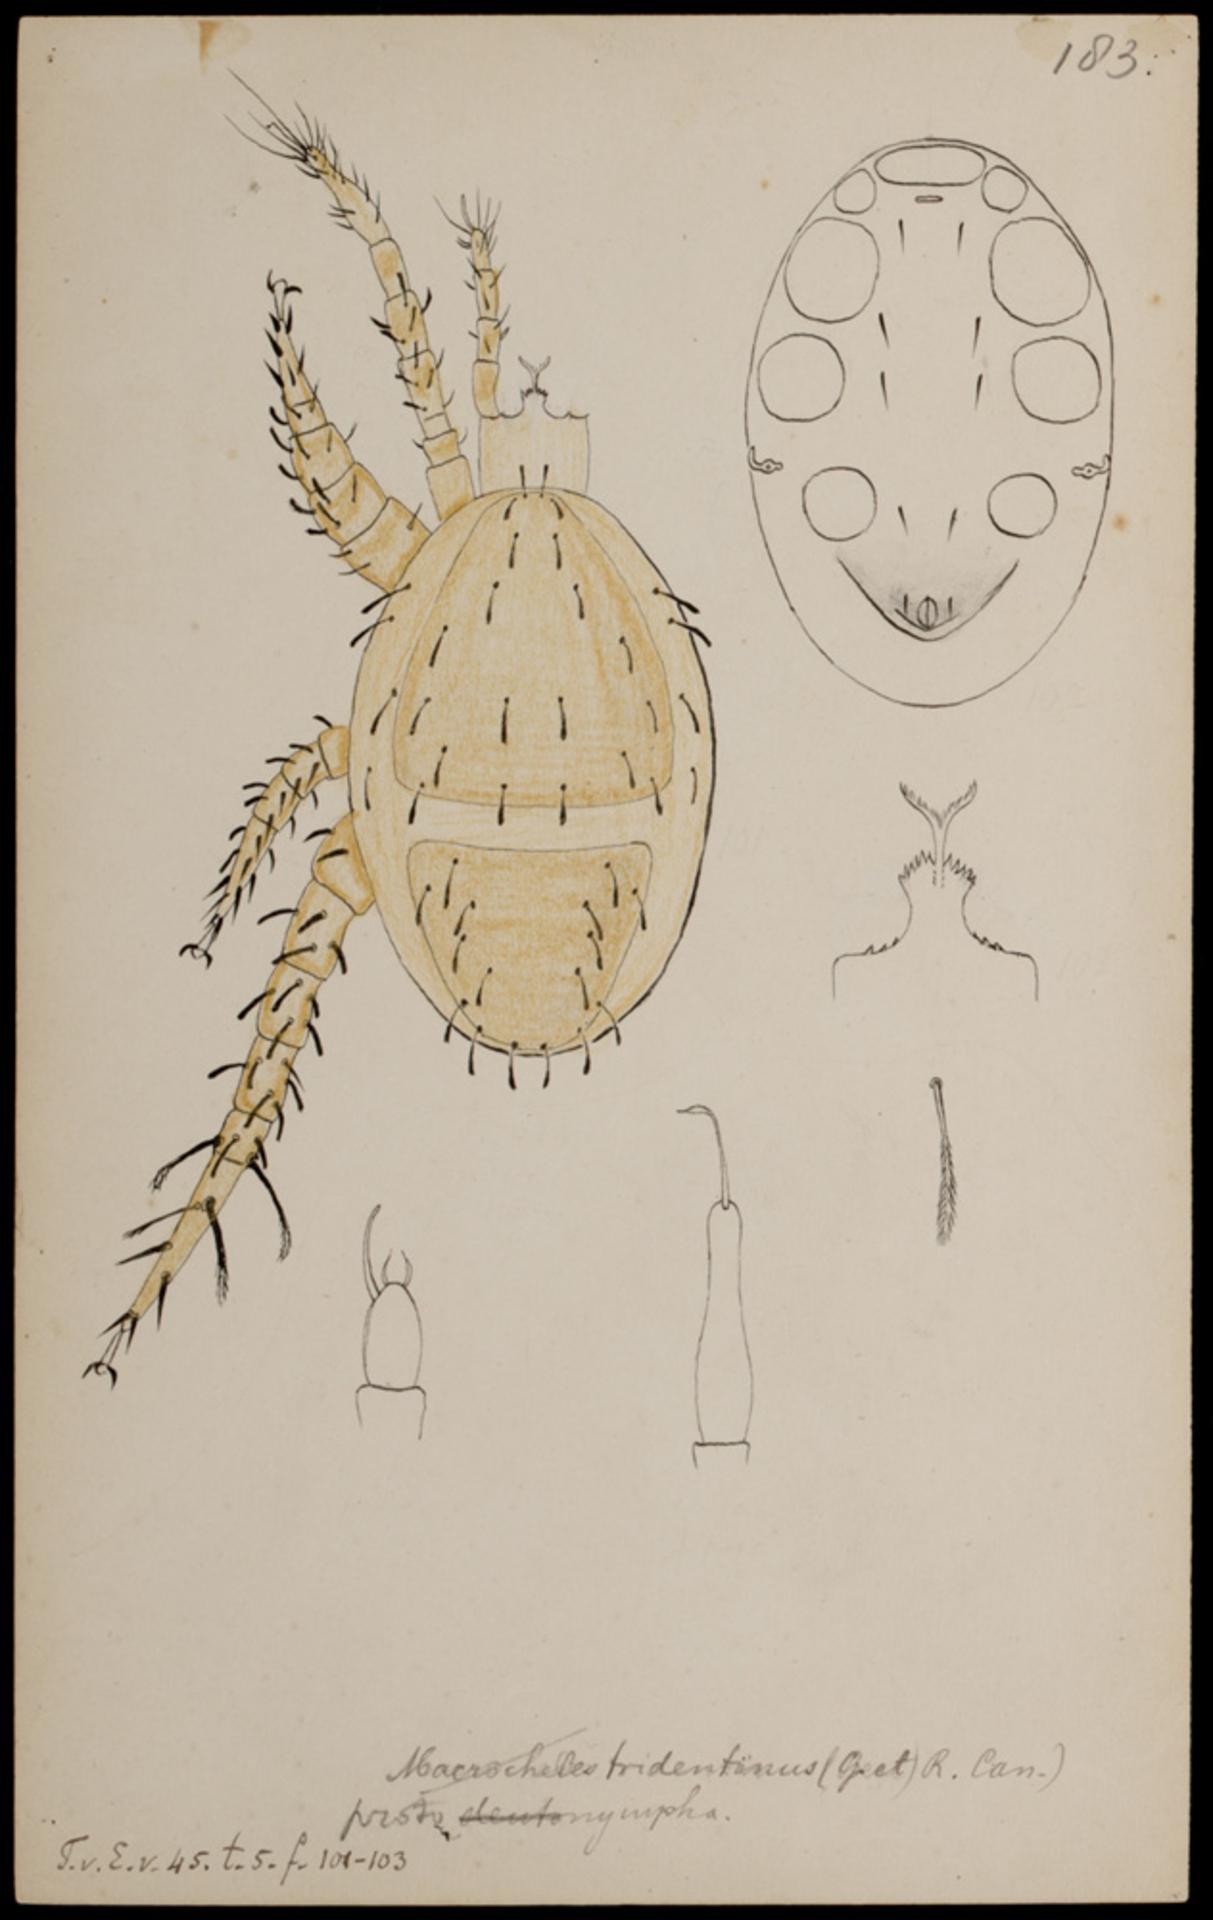 RMNH.ART.1043 | Macrocheles tridentinus (Canestrini & Canestrini)